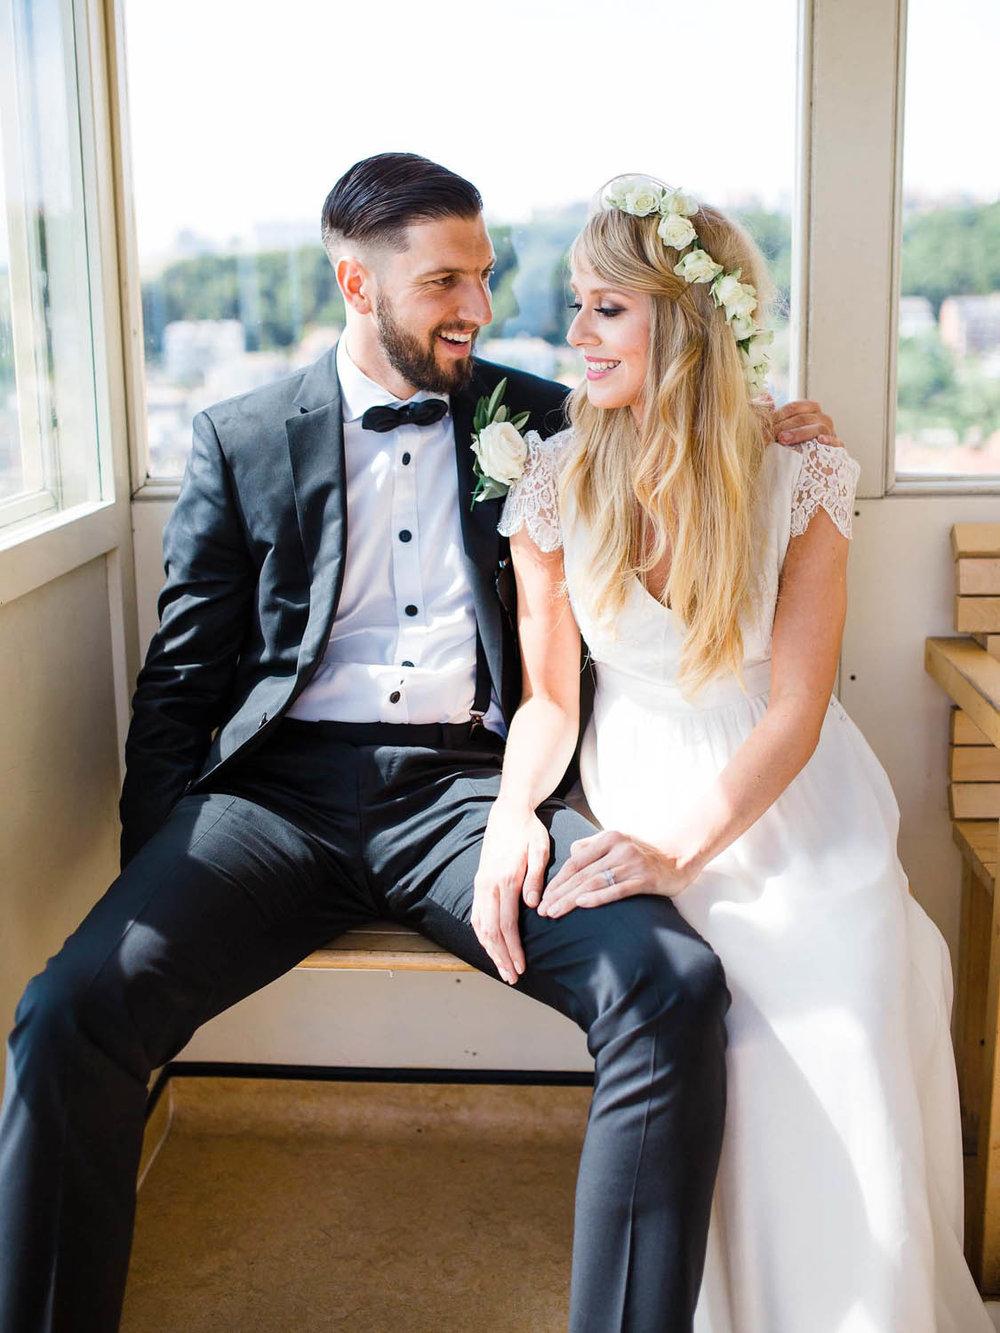 Amy O'Boyle Photography, Destination & UK Fine Art Film Wedding Photographer, Hastings Wedding-18.jpg